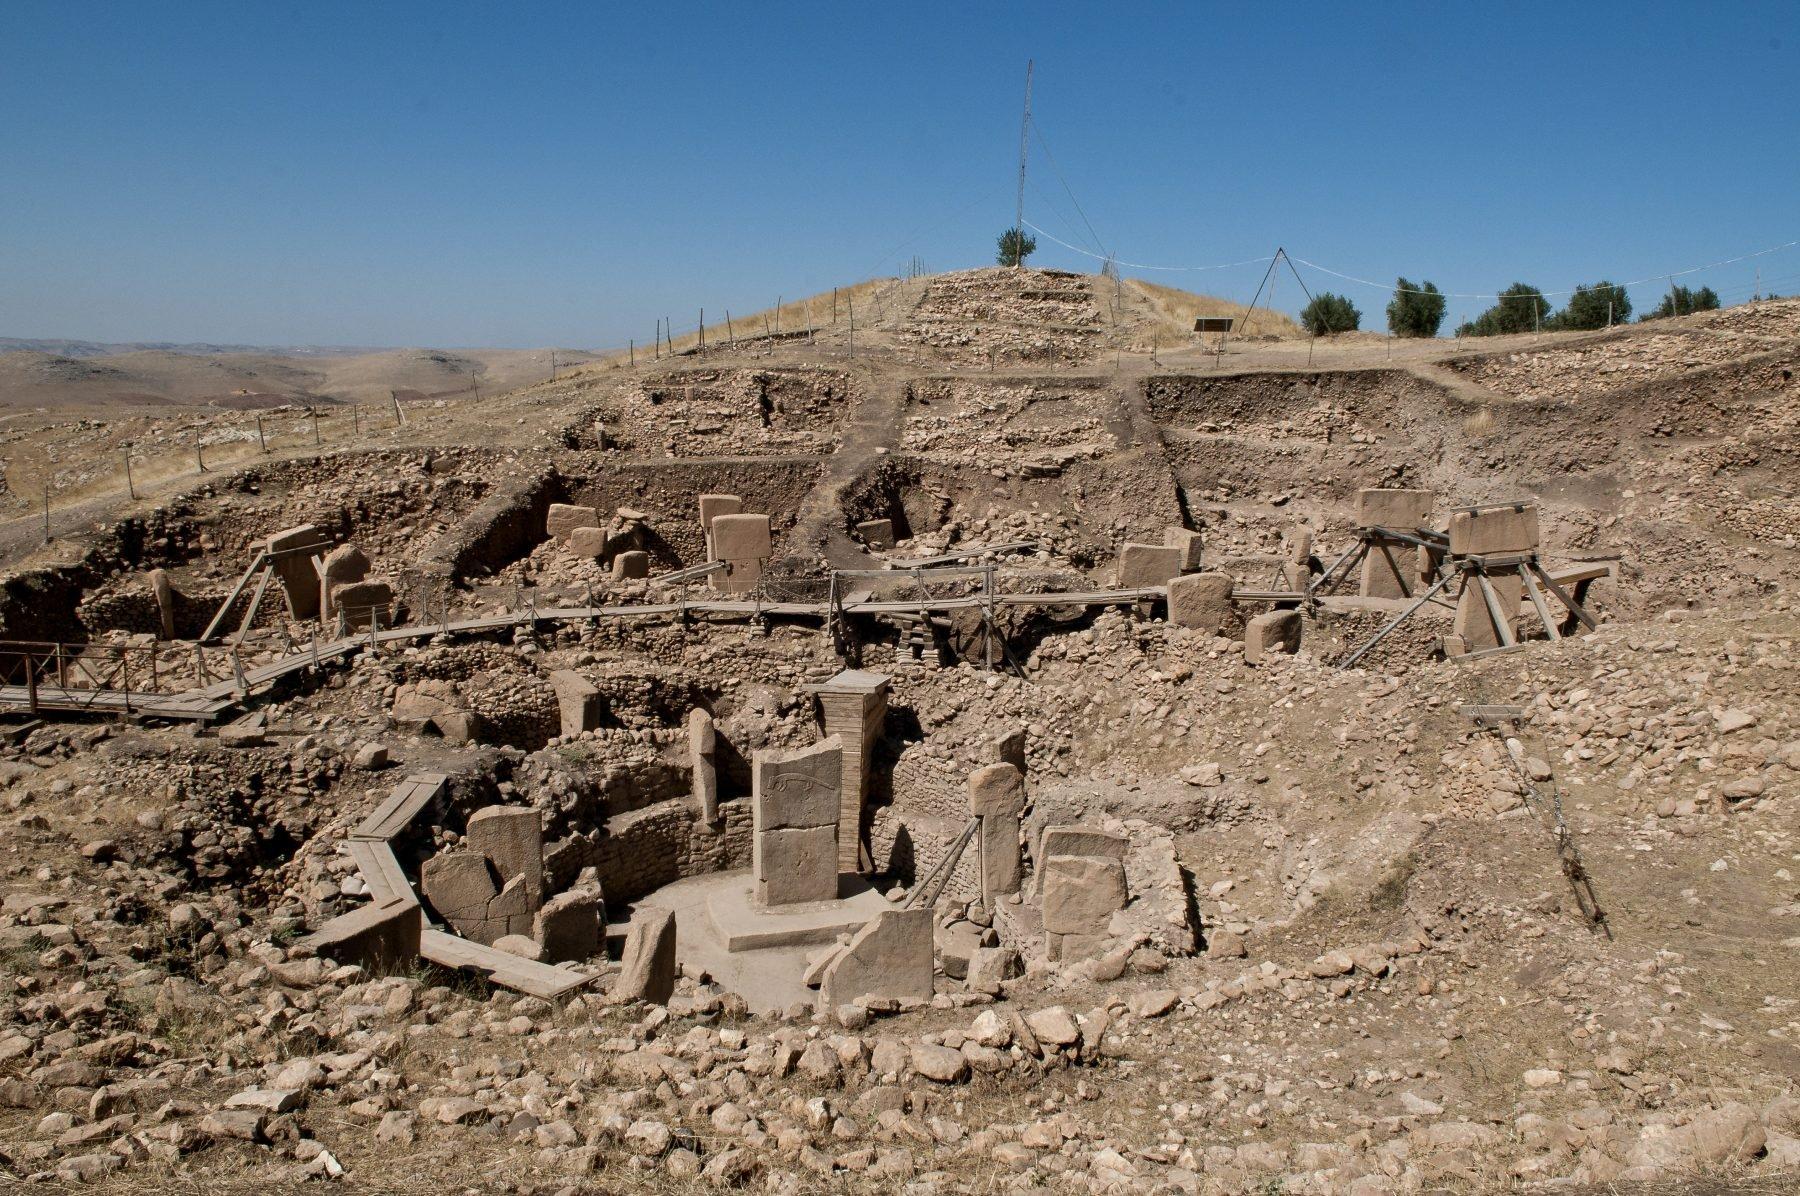 El Primer templo de la historia